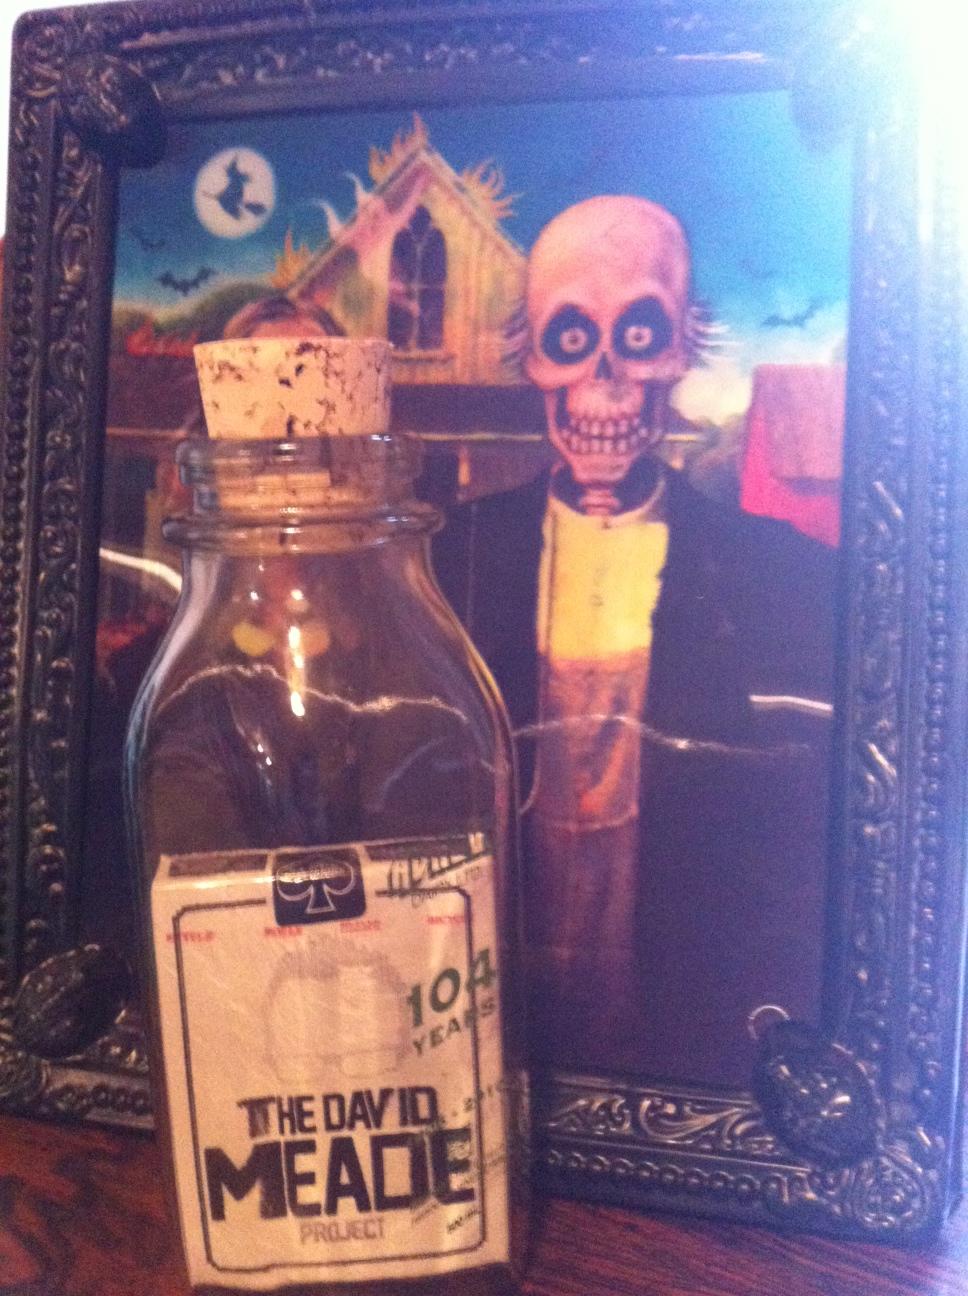 The David Meade Project sends me a Magic Bottle...